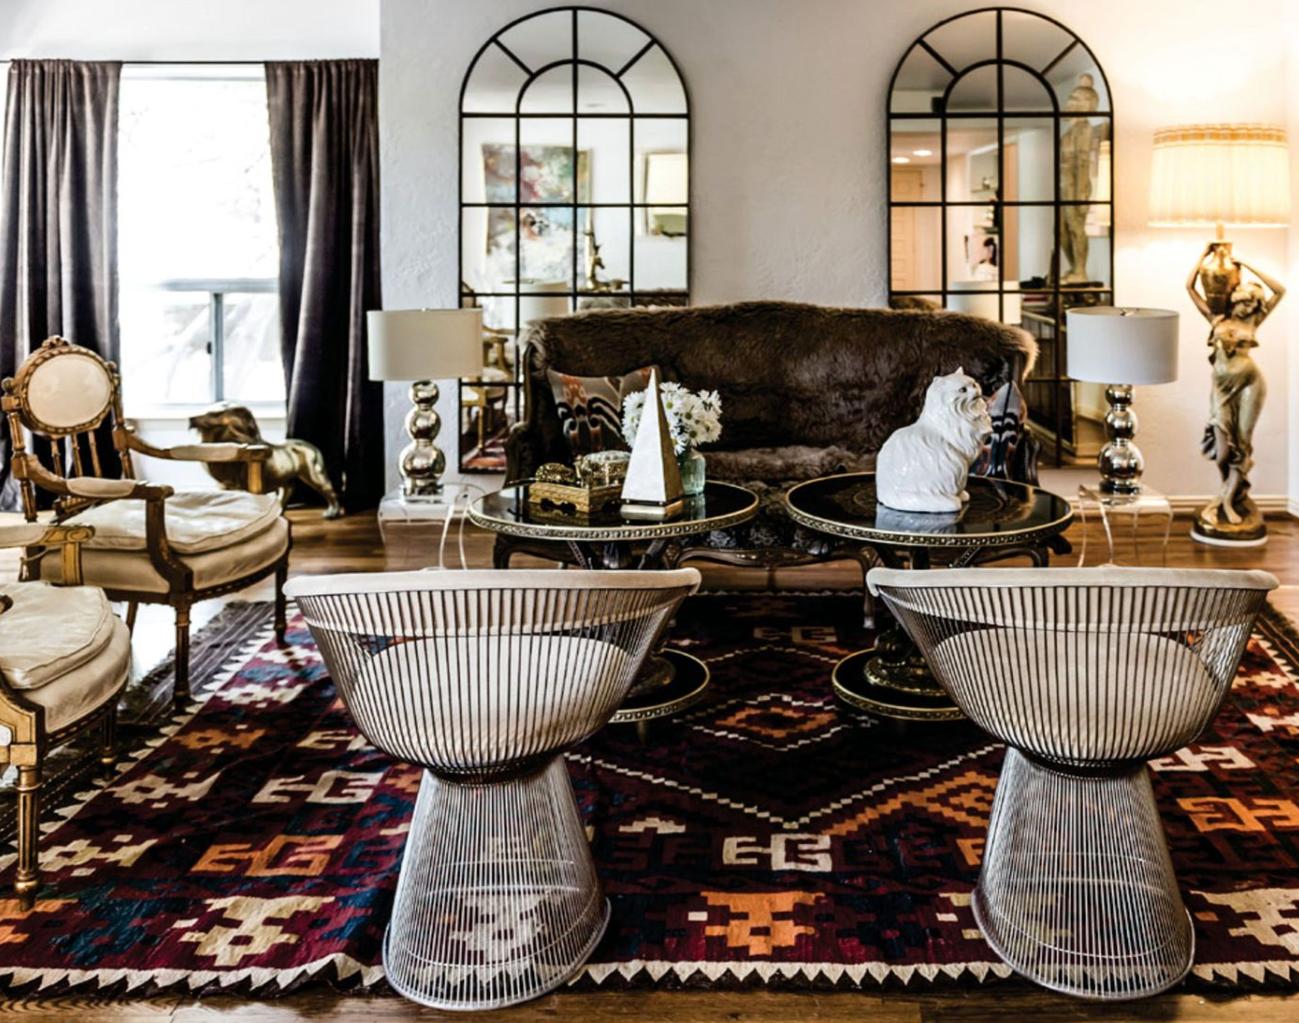 Livable machine gilded tribal love for Best interior design blogs 2012